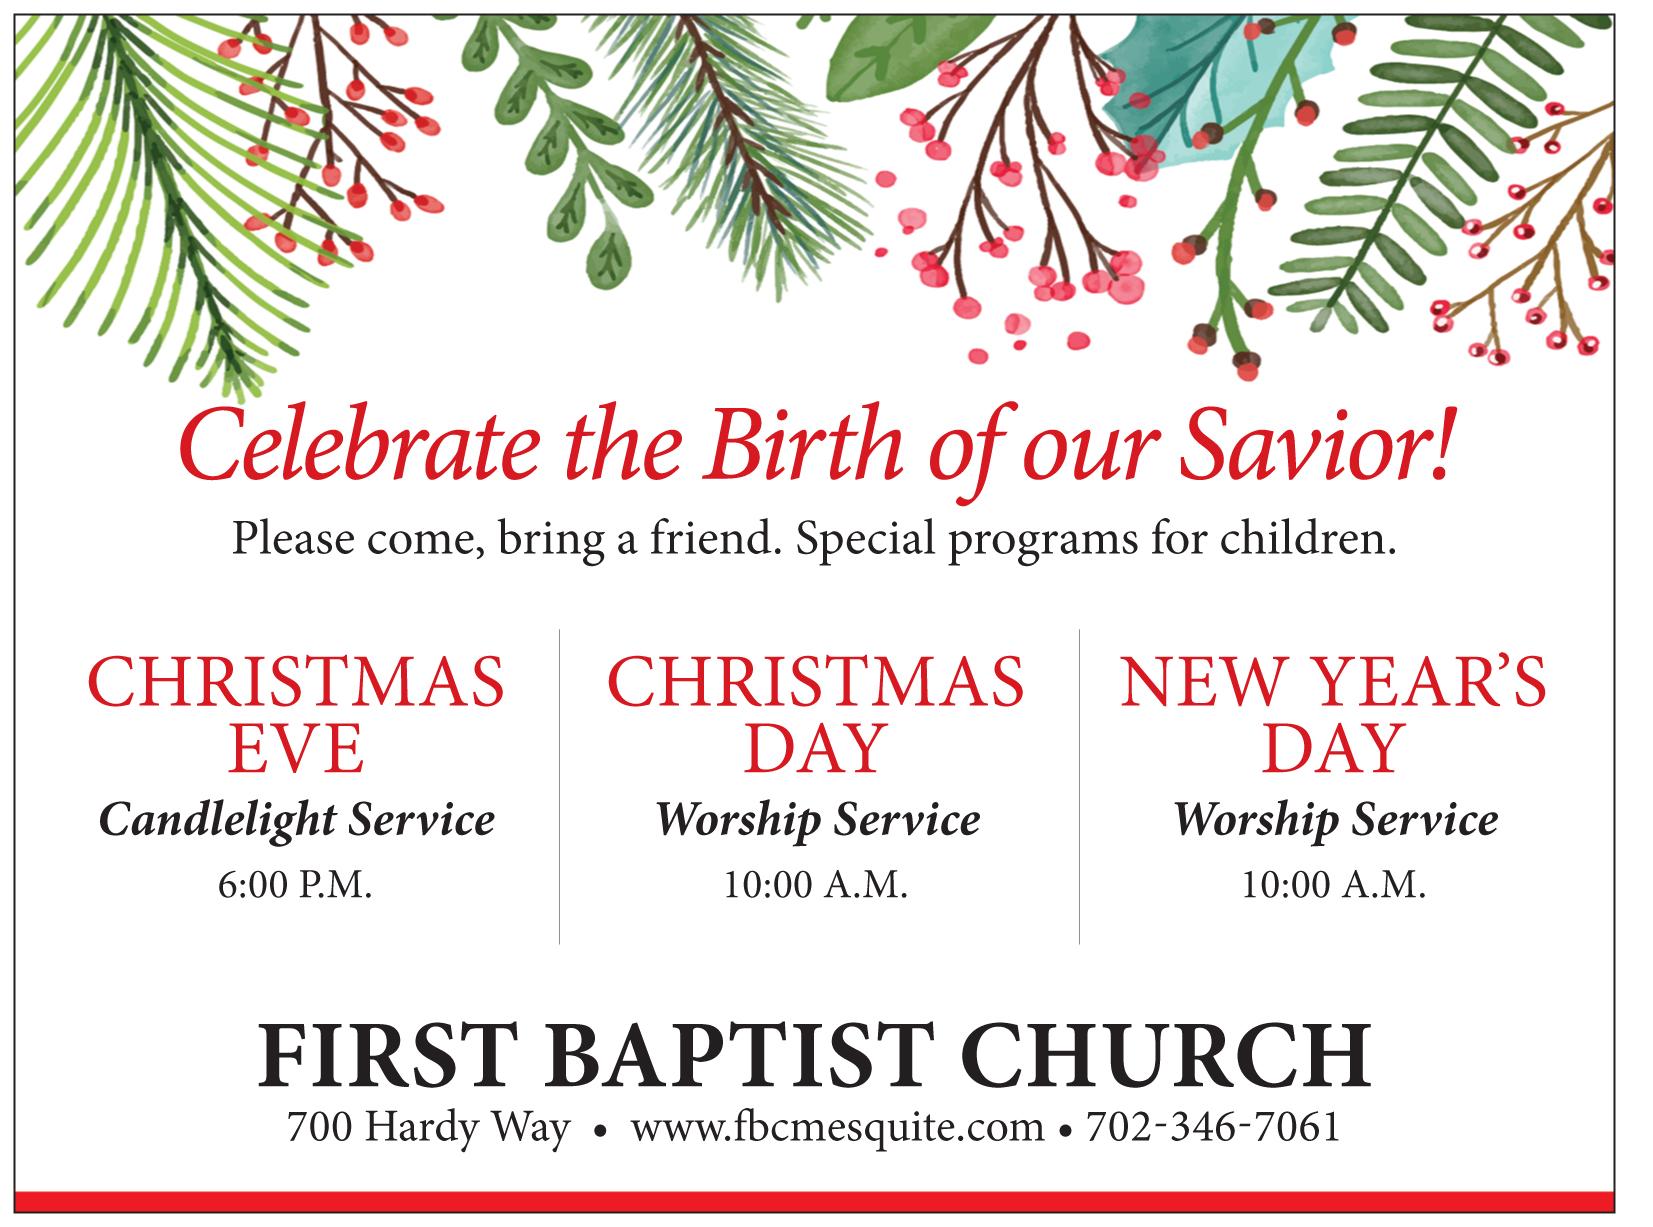 First Baptist Church Christmas Services